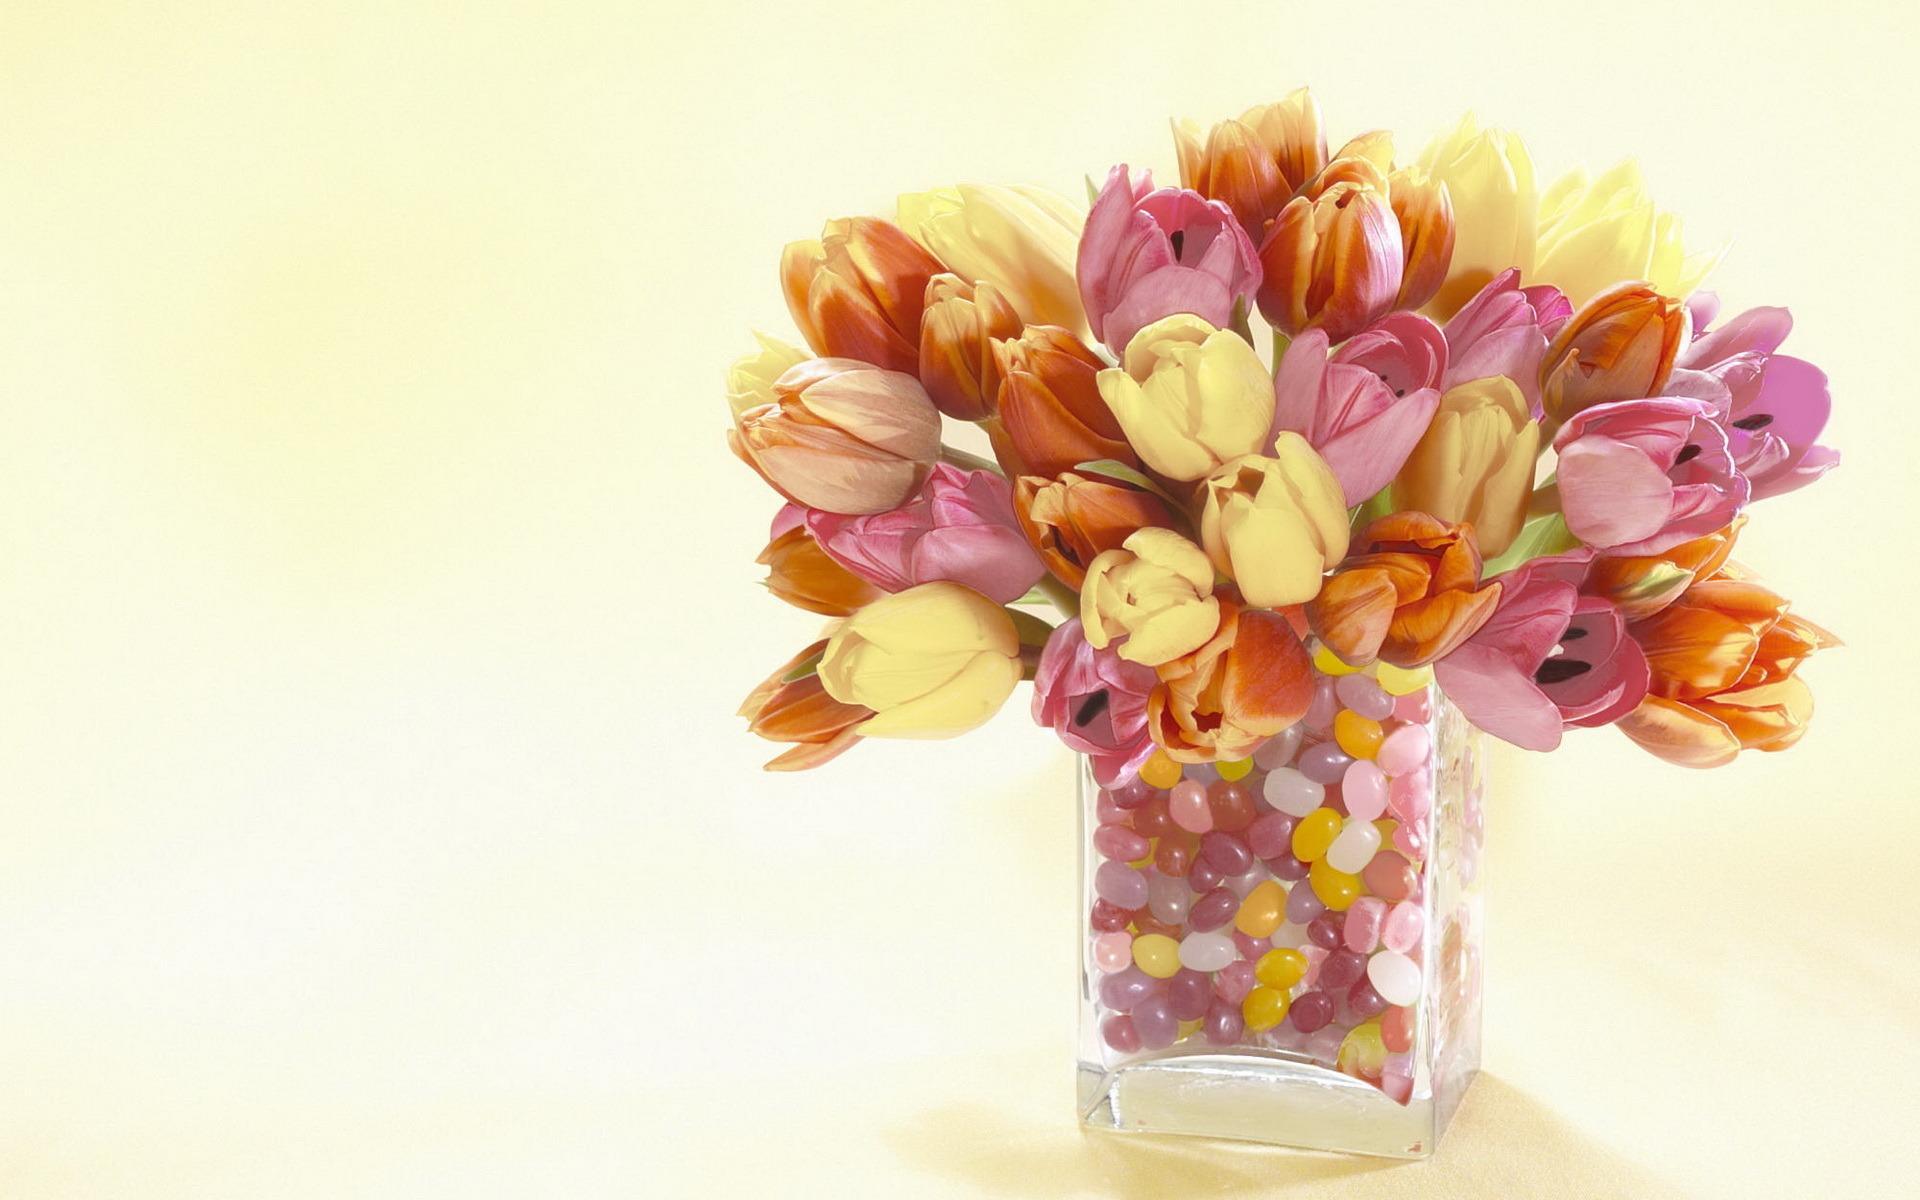 Обои на рабочий стол цветы тюльпаны